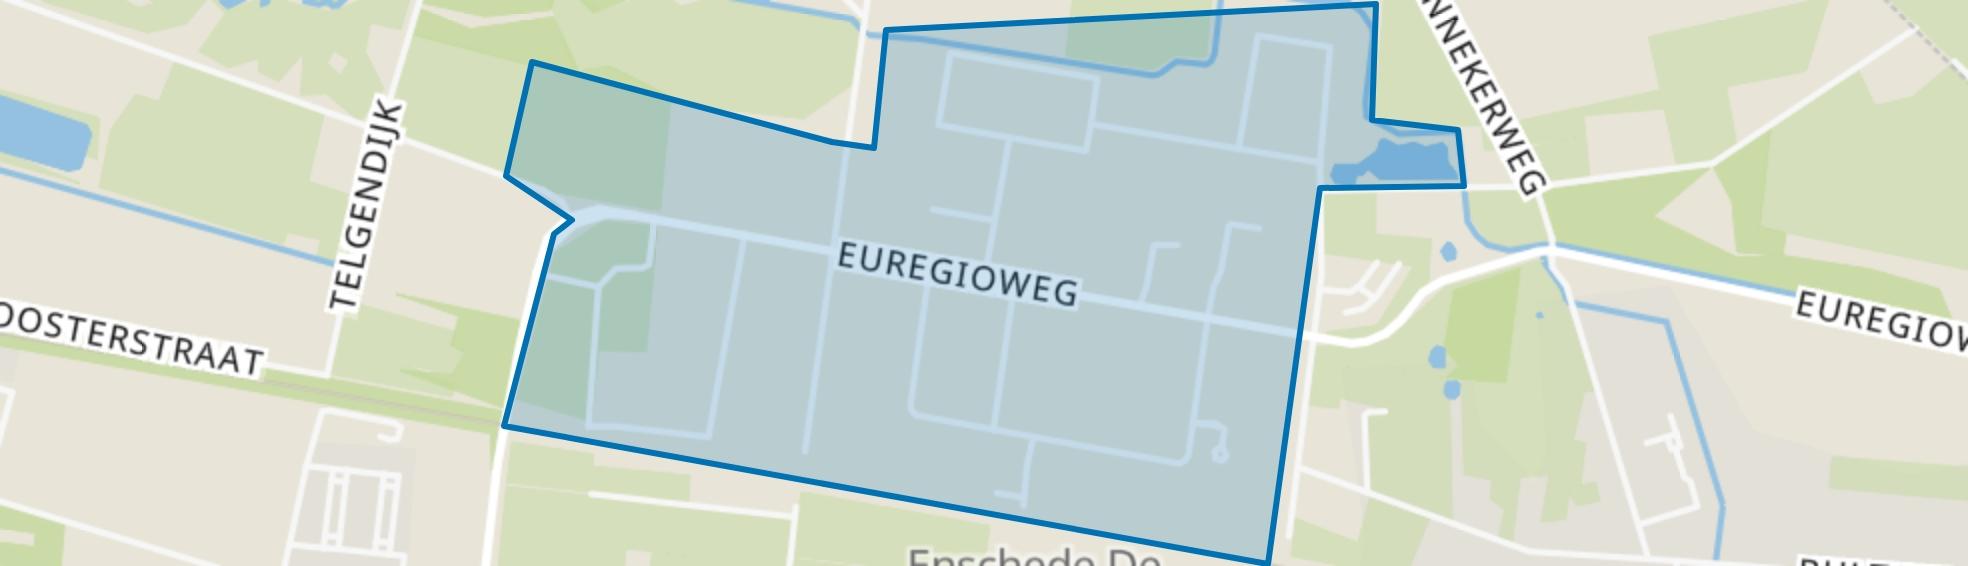 De Slank, Enschede map